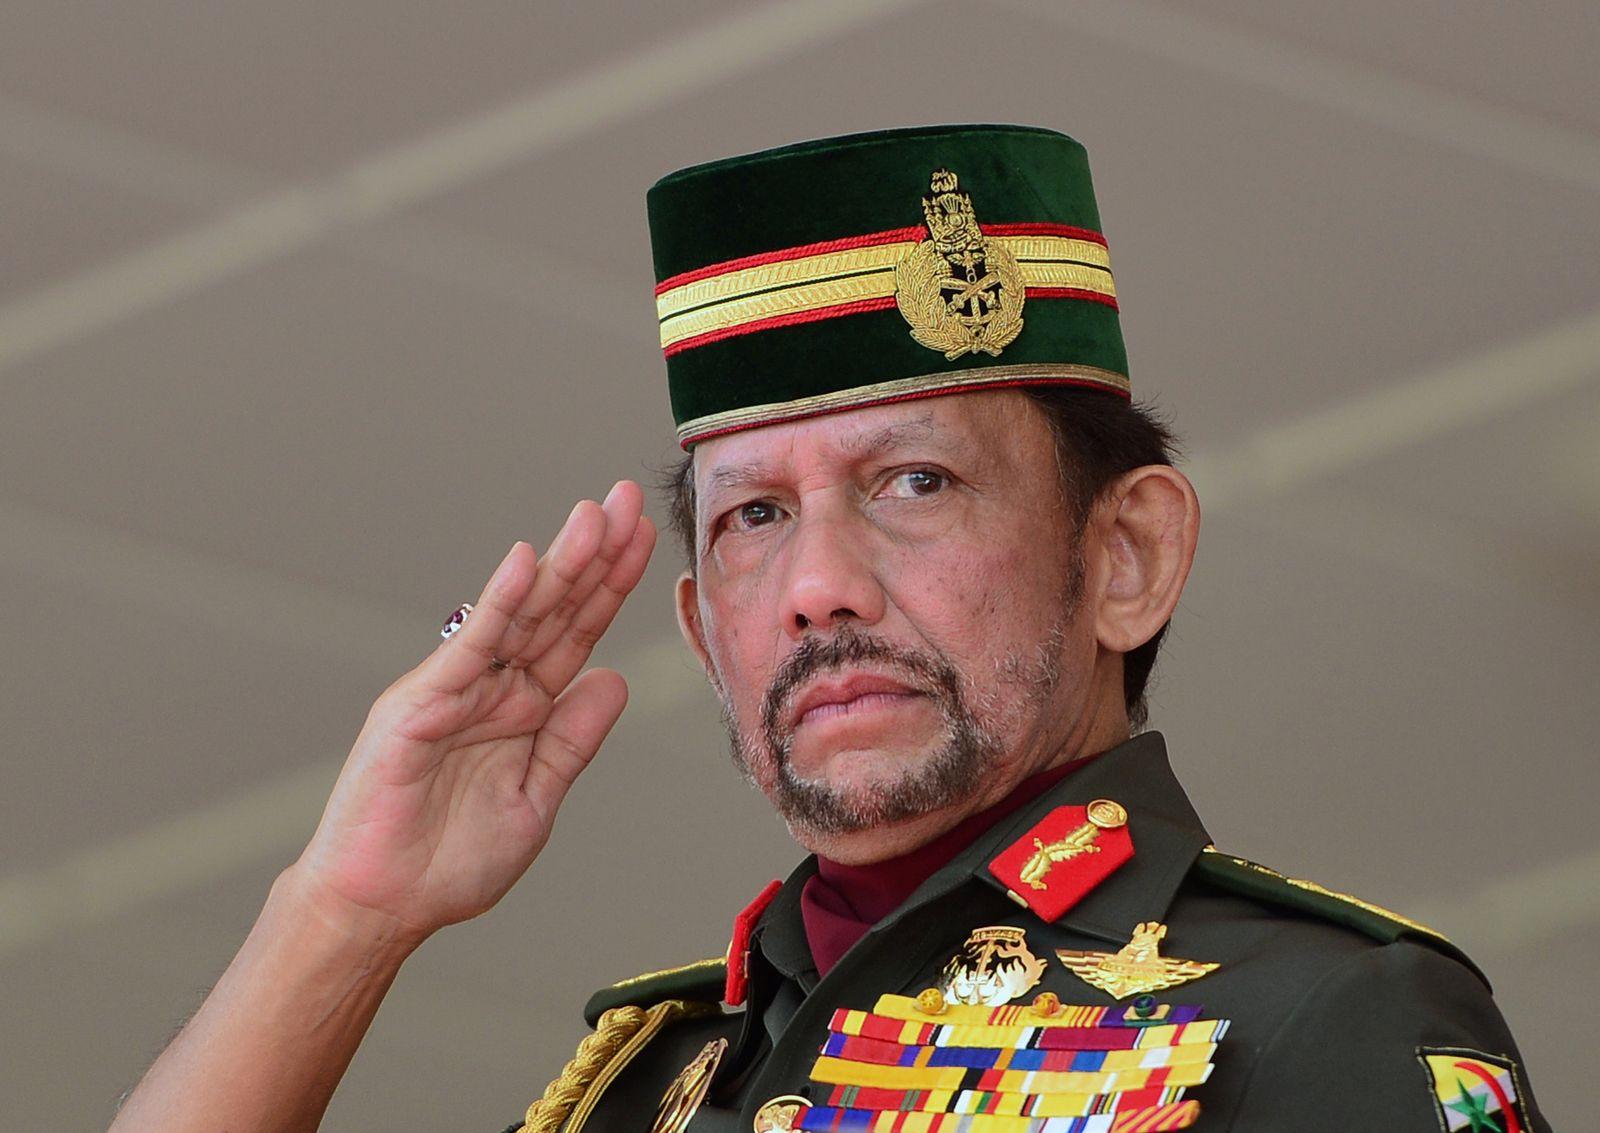 Brunei / Sultan Hassanal Bolkiah